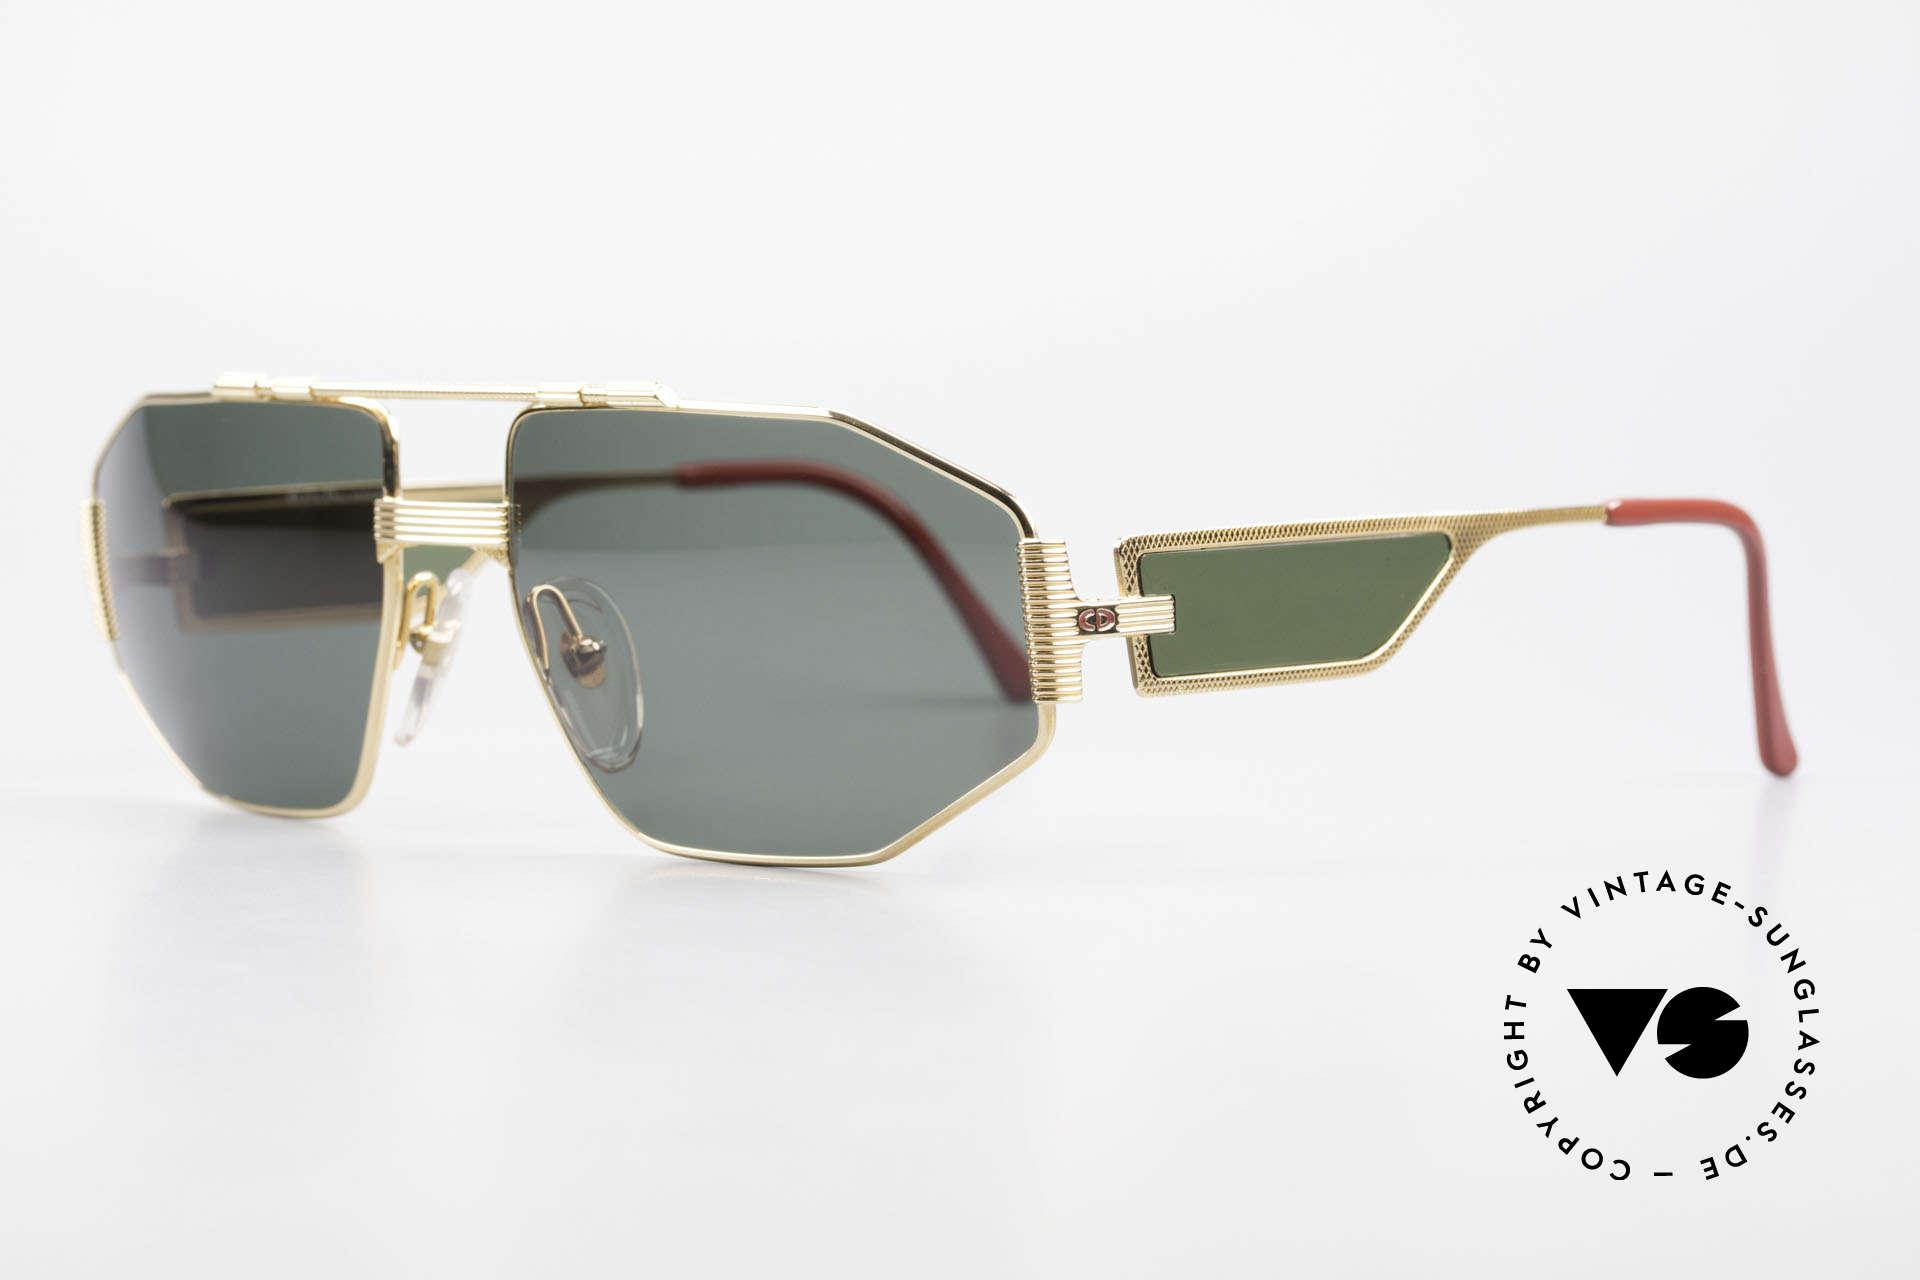 Christian Dior 2427 Dior Monsieur 80's Sunglasses, luxury men's sunglasses, the full frame is GOLD-plated, Made for Men